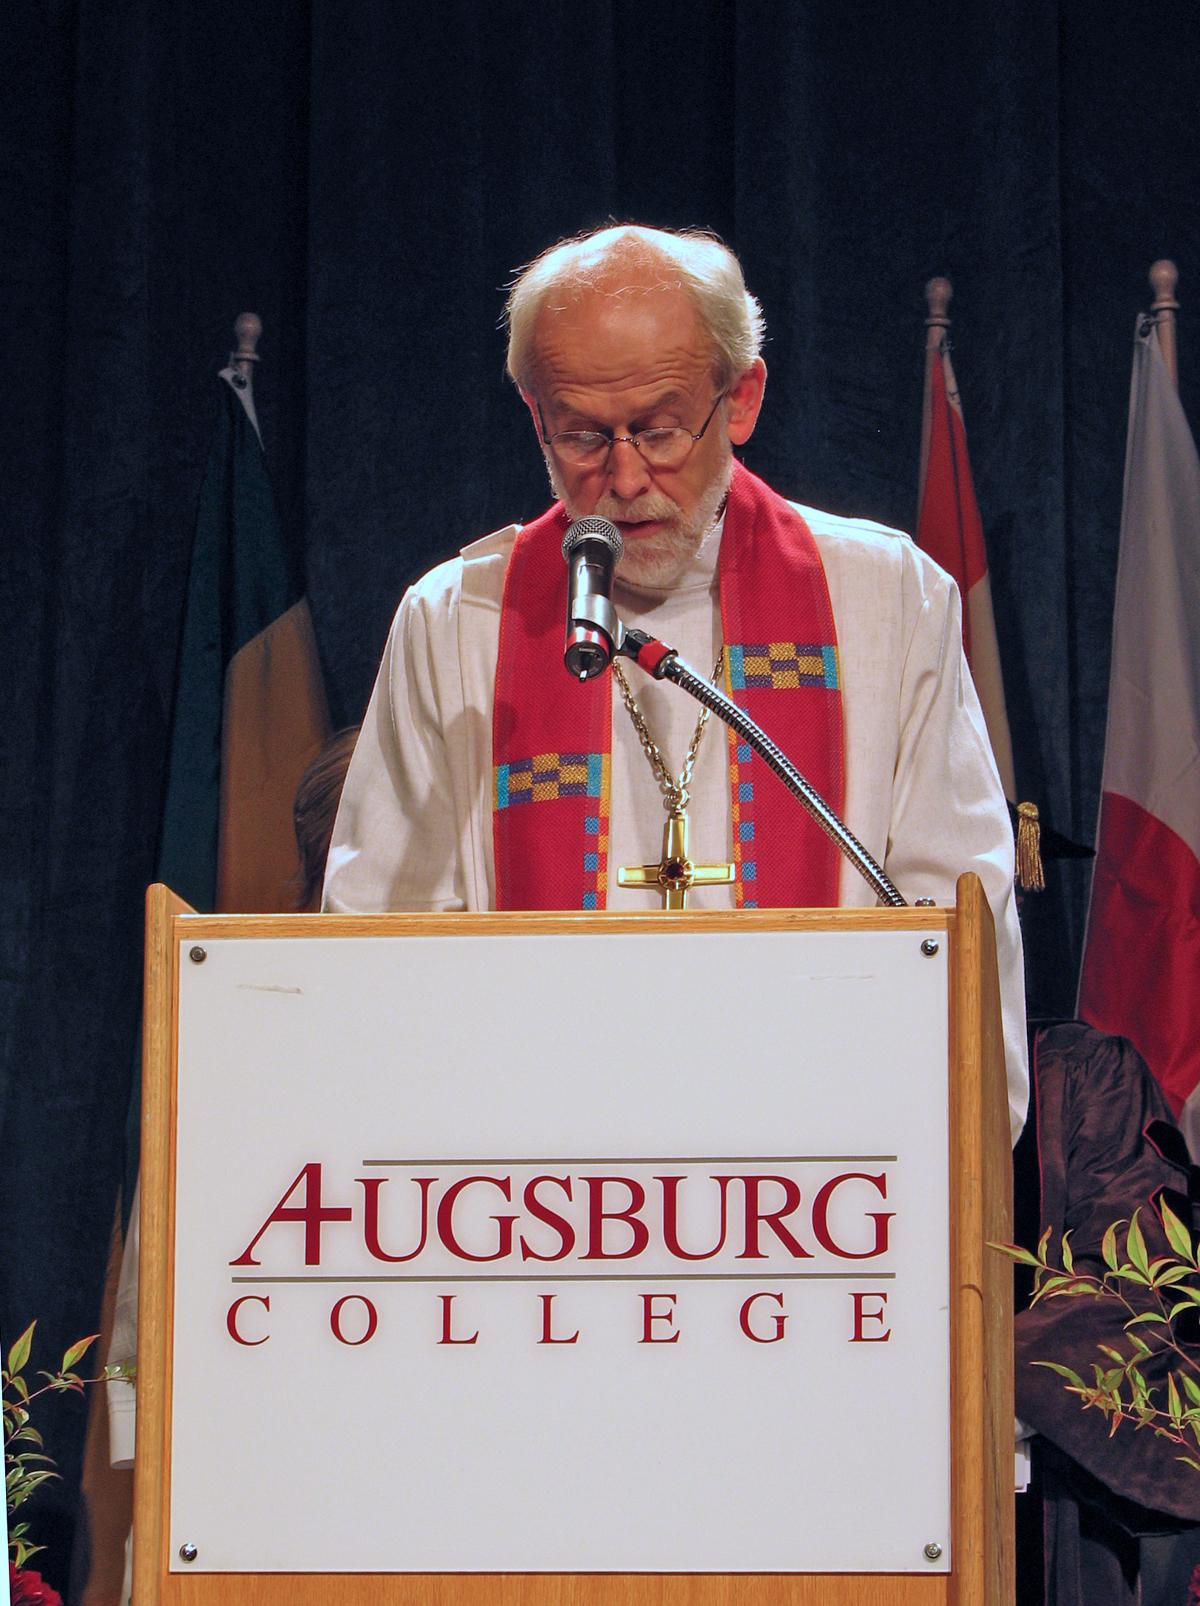 Hanson speaking at the inauguration of [[Augsburg University]] President Paul C. Pribbenow on Oct. 20, 2006.